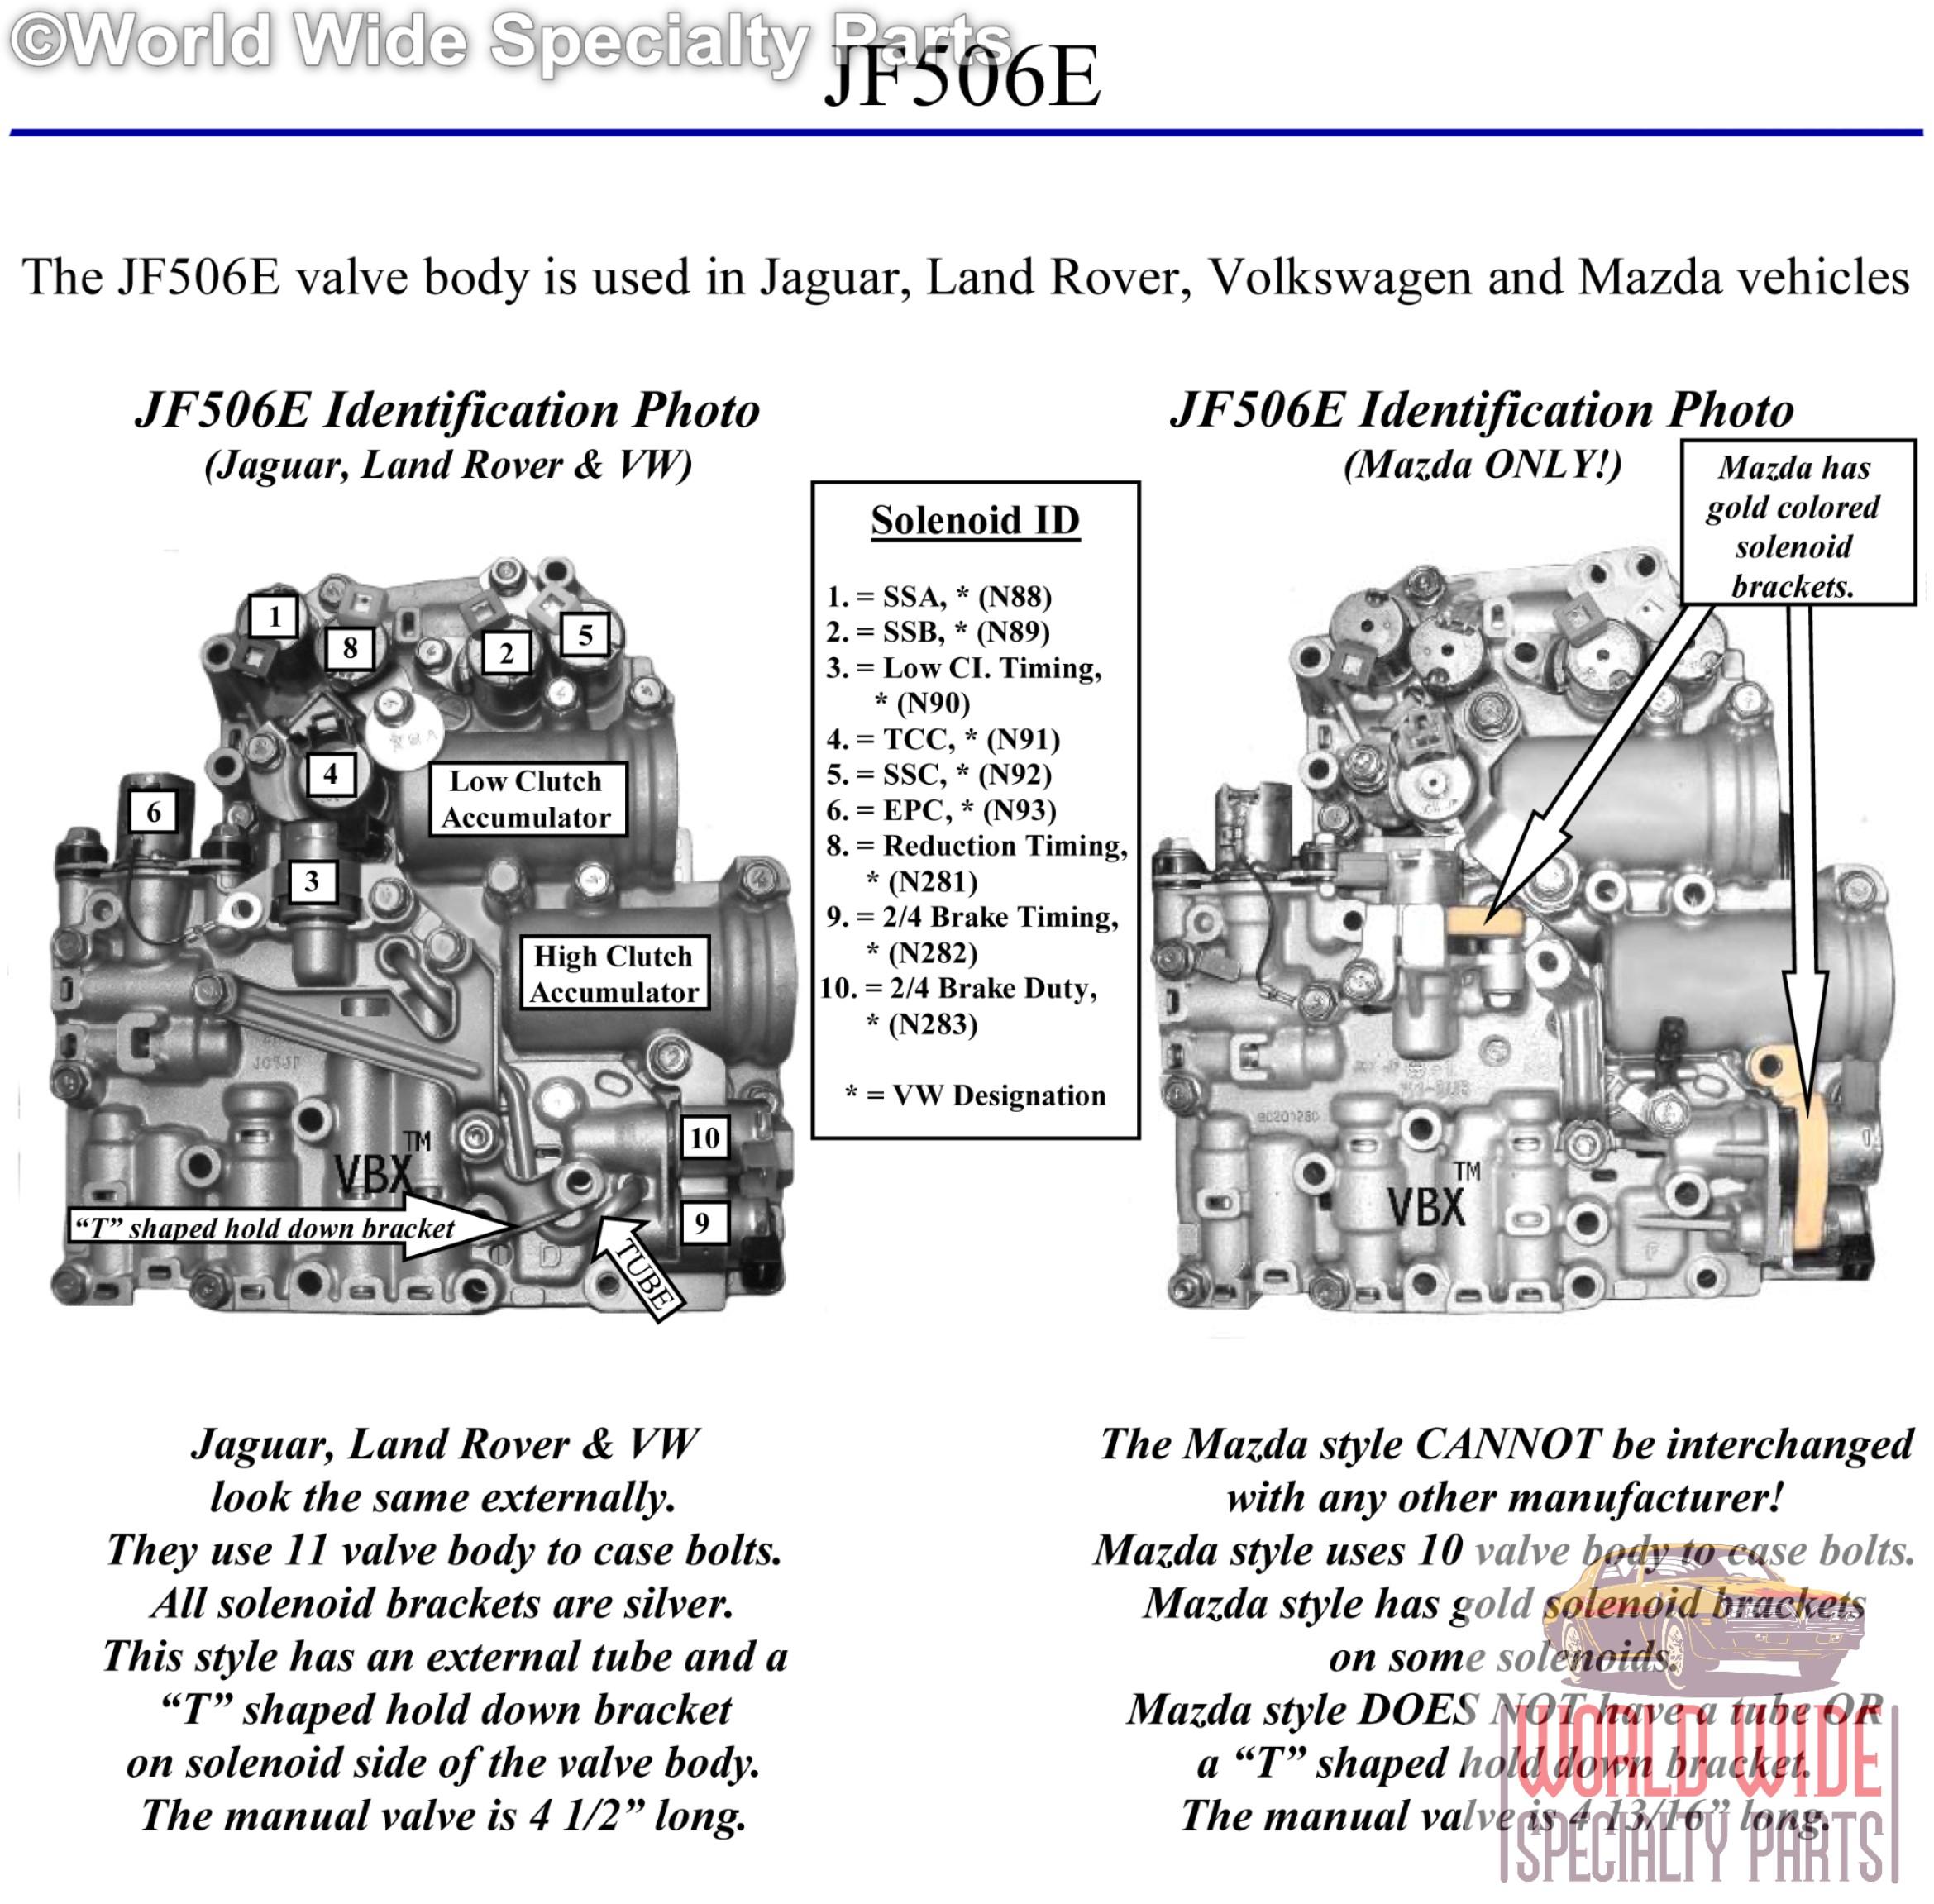 Volkswagen 09A,JF506E Valve Body 2000-UP(Lifetime Warranty